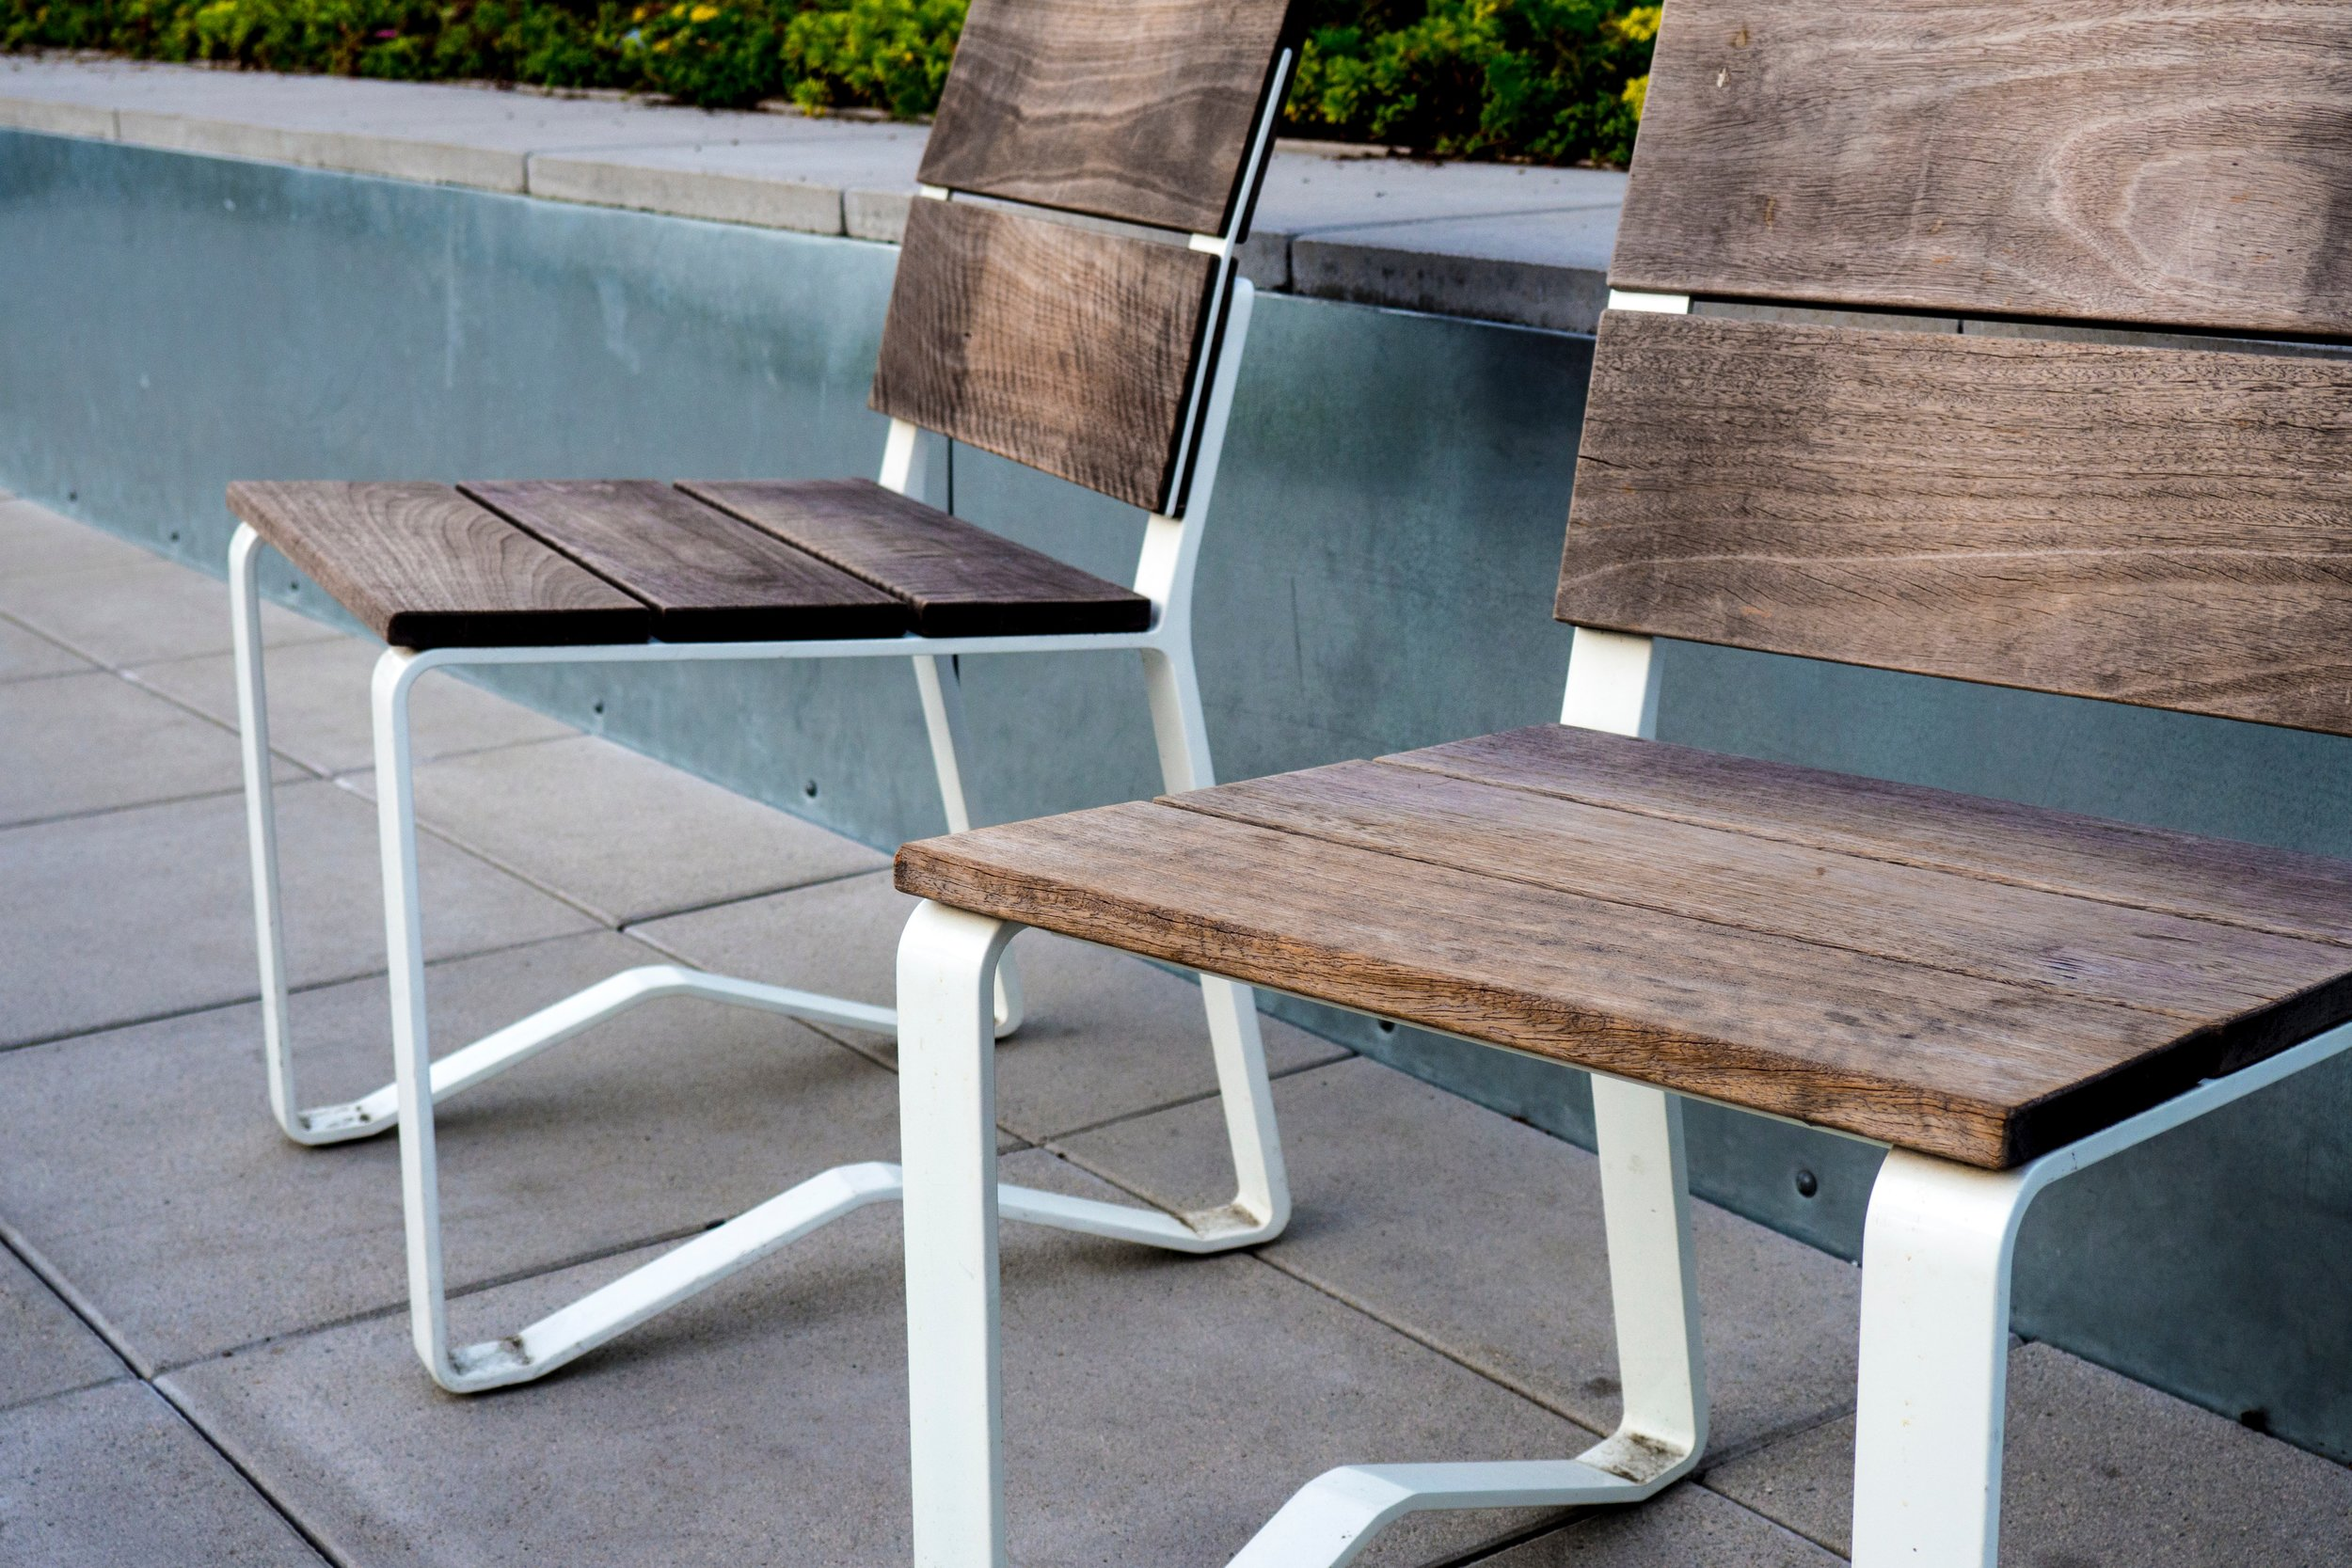 chairs-furniture-seat-226378.jpg